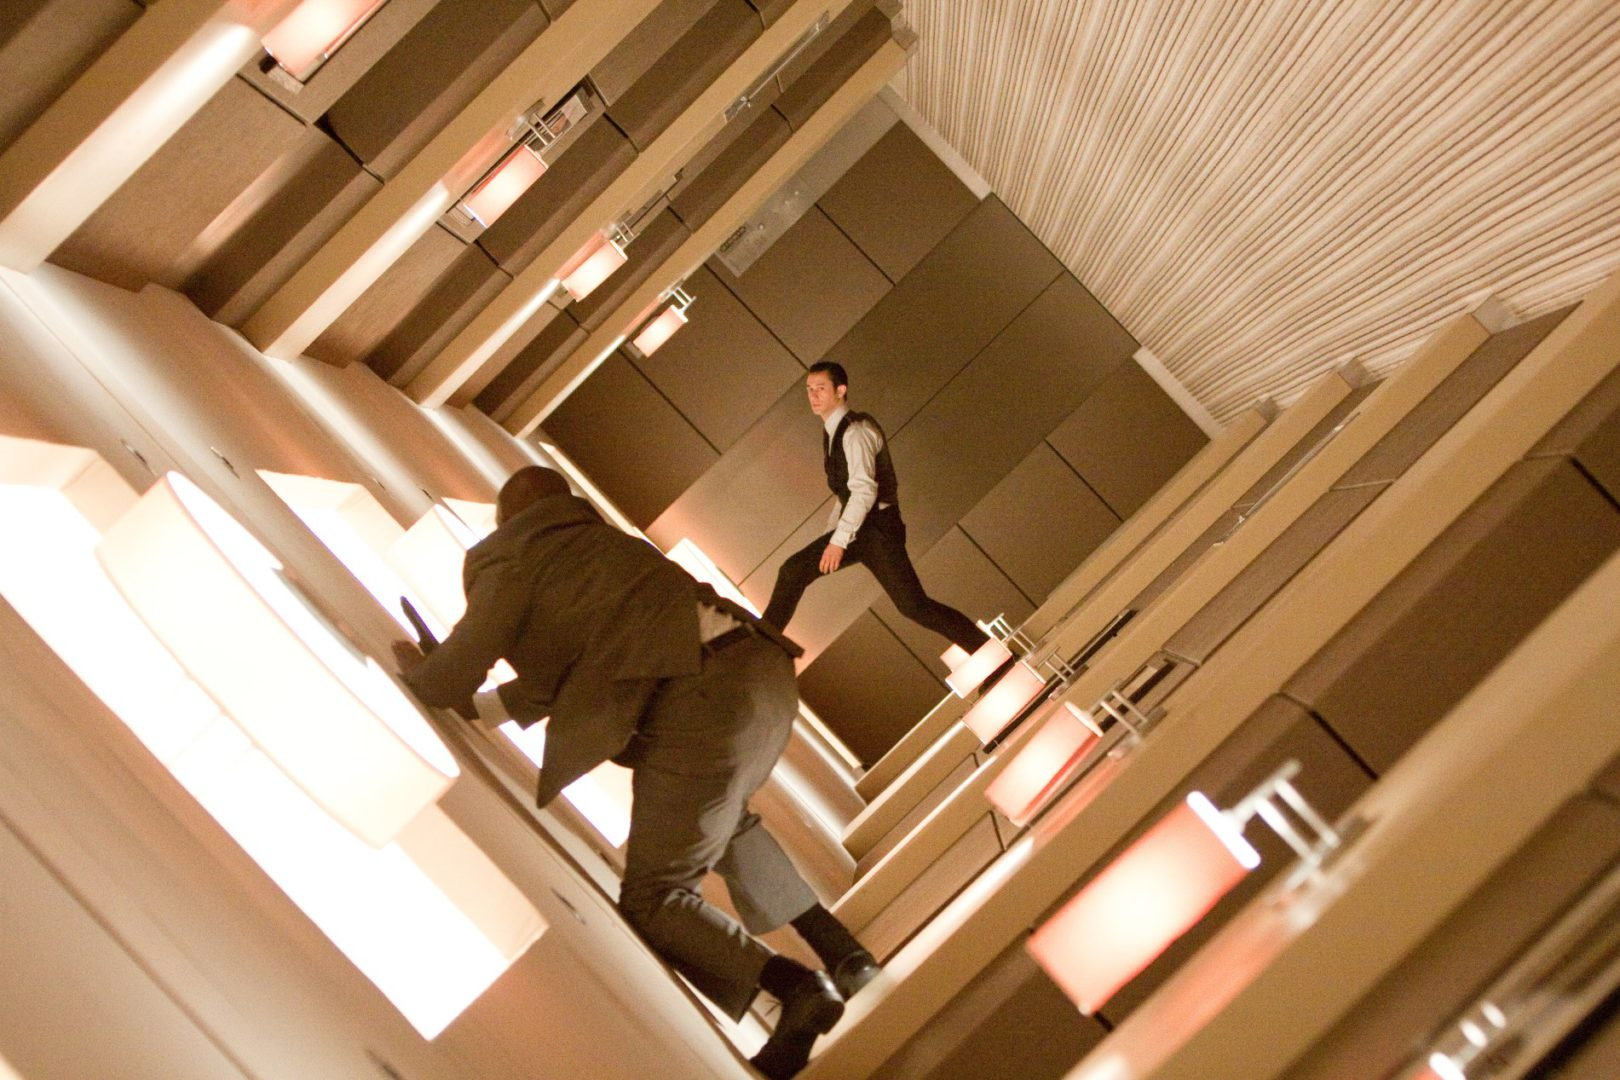 Inception hallway scene